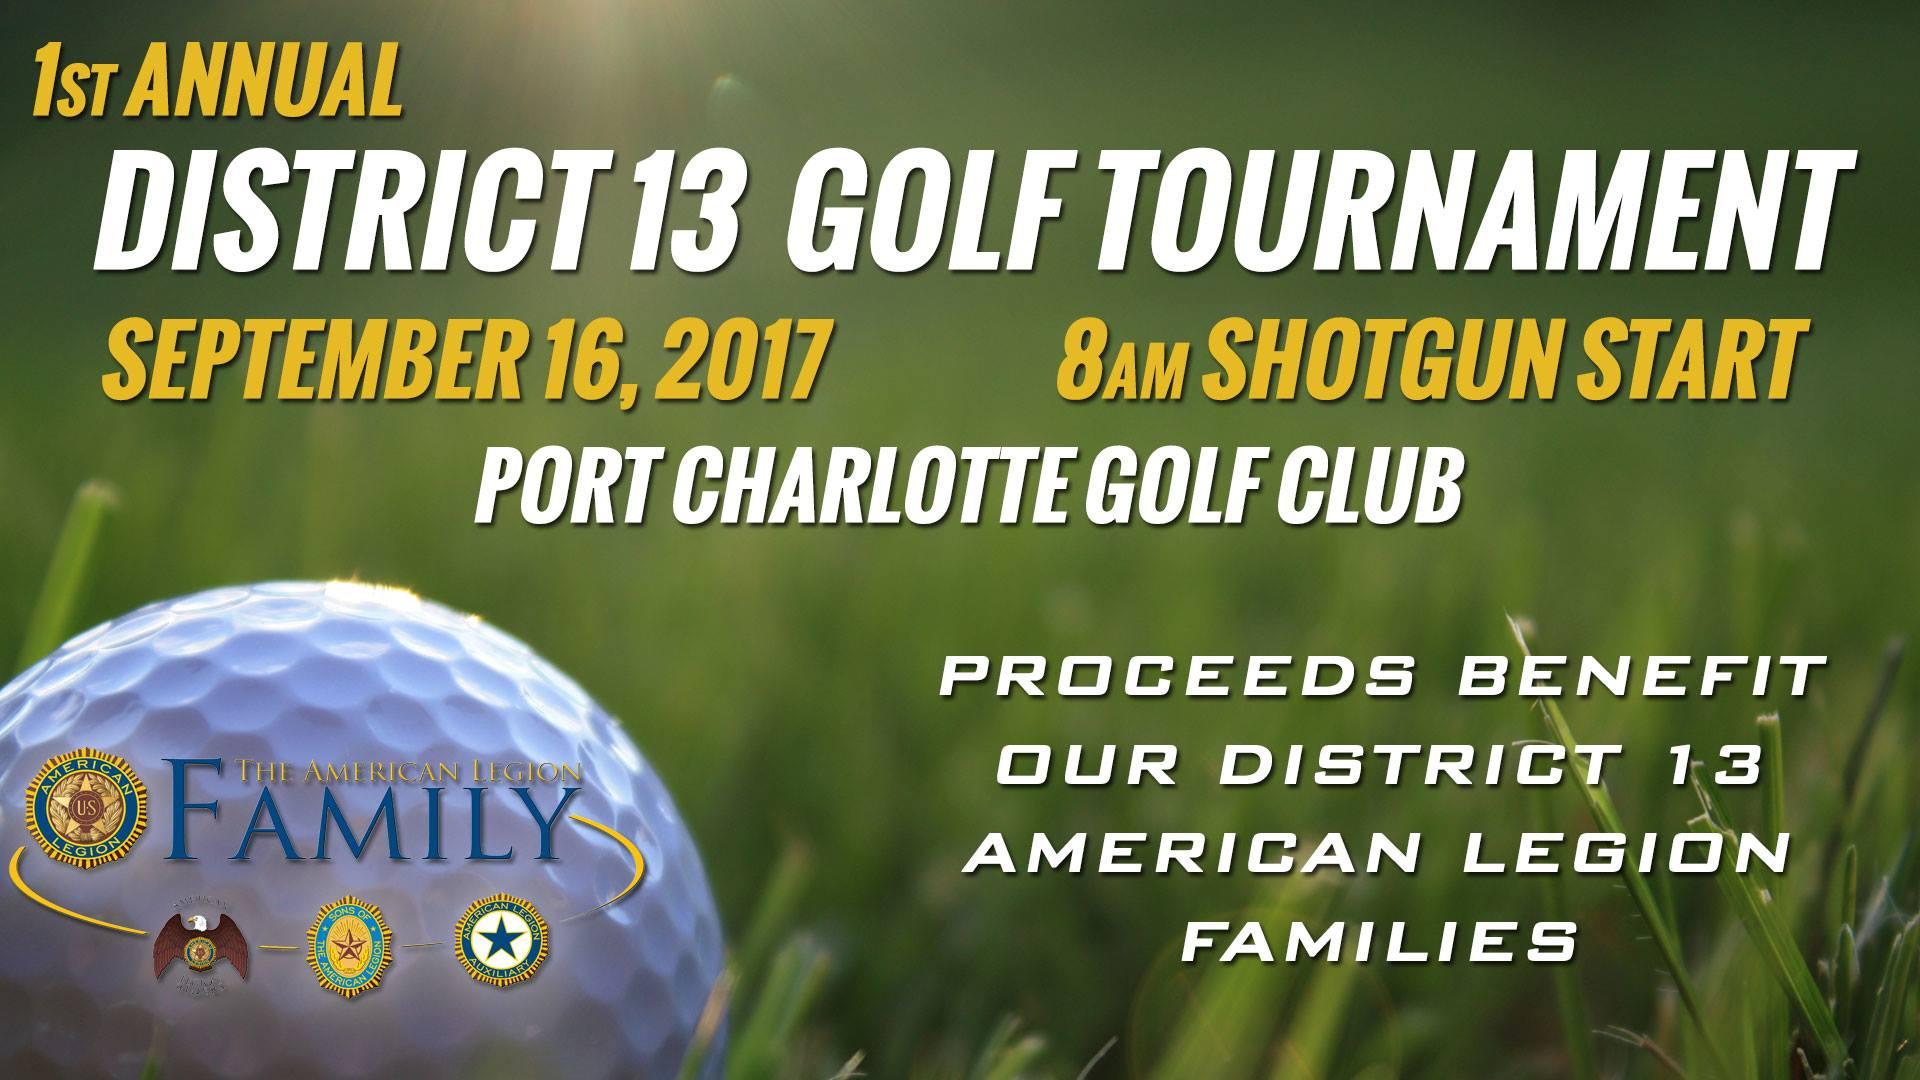 District 13 Golf Tournament